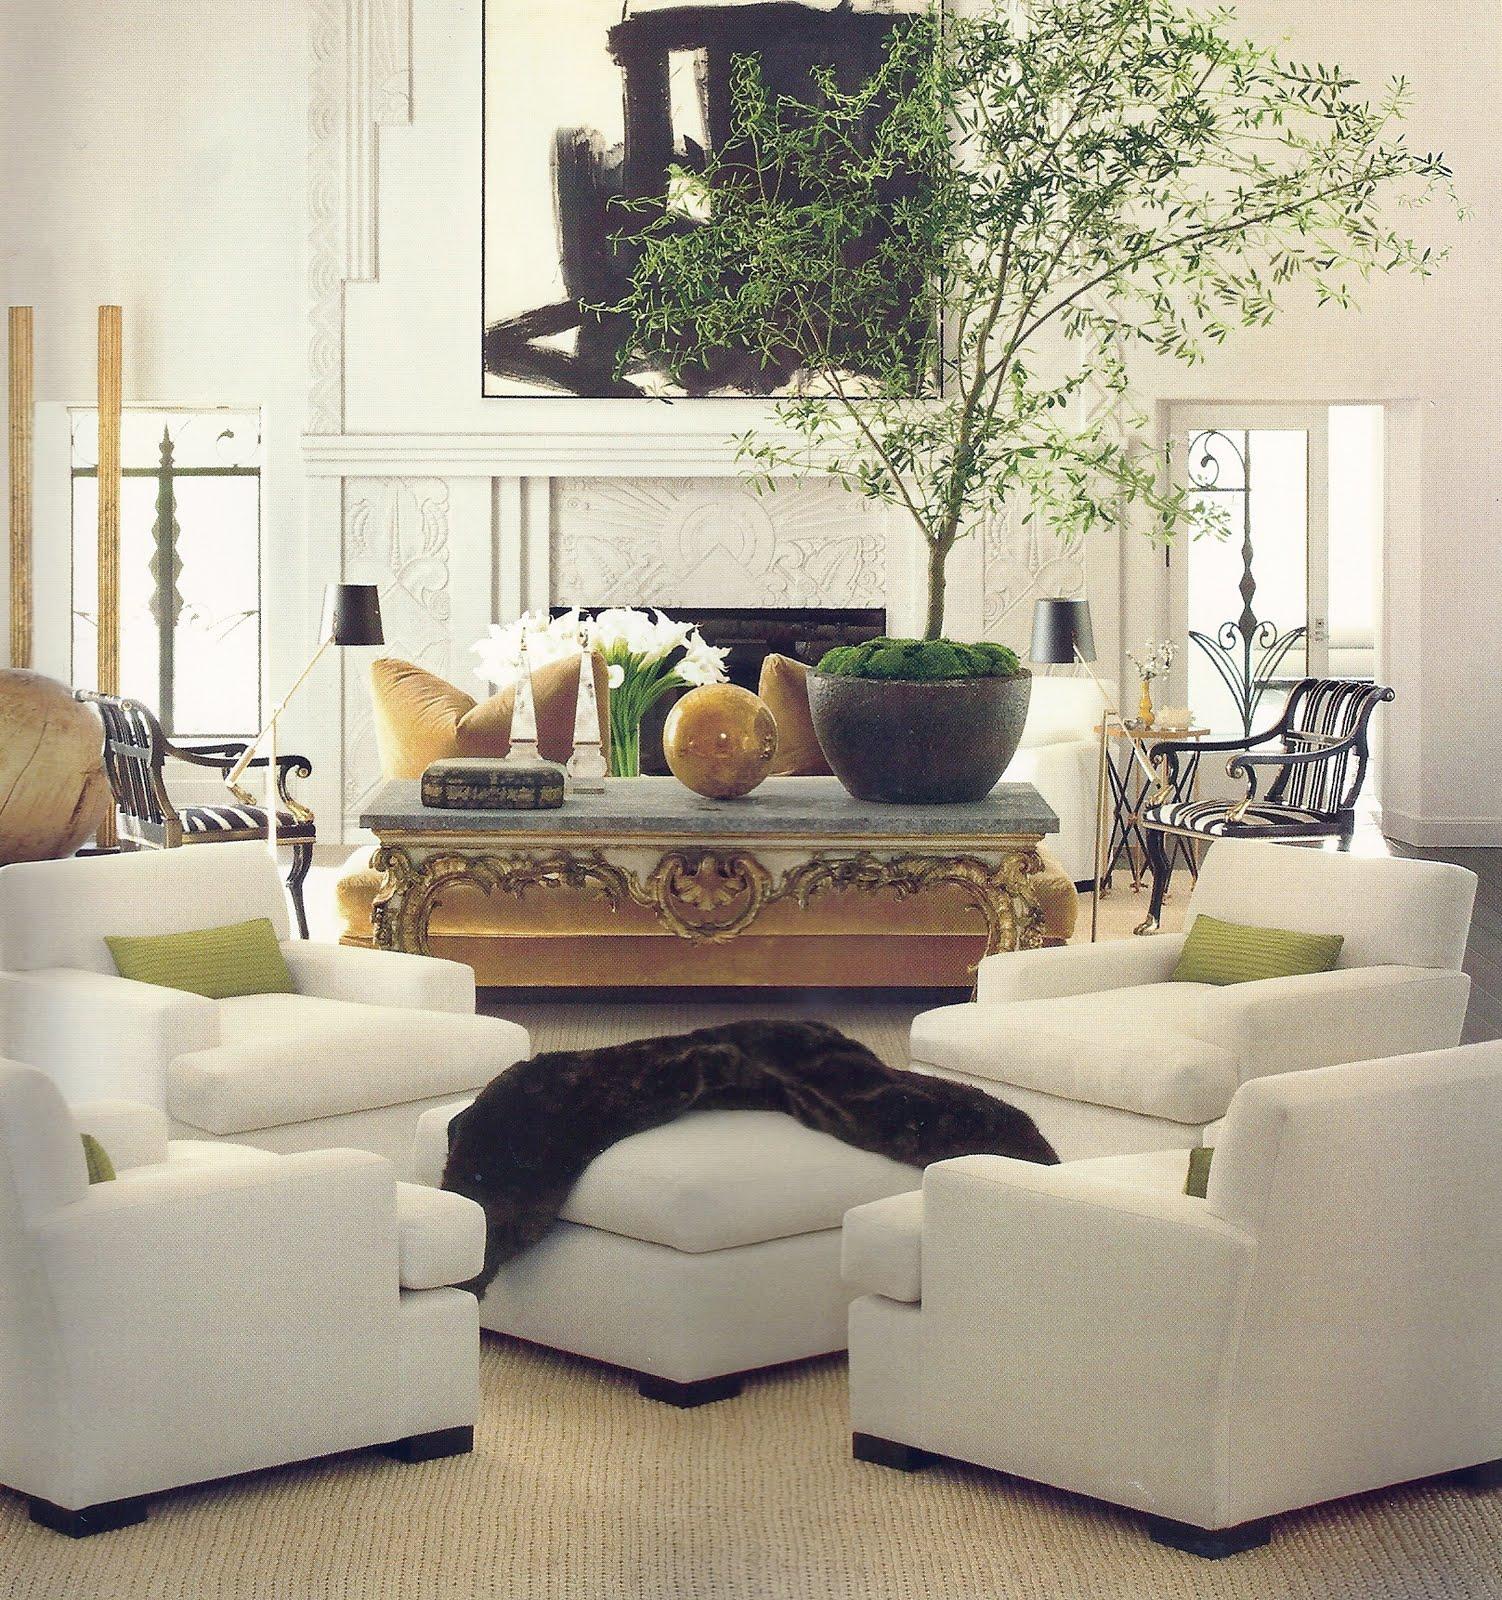 Us Interior Designers: US Interior Designs: RICHARD HALLBERG IN LOS ANGELES